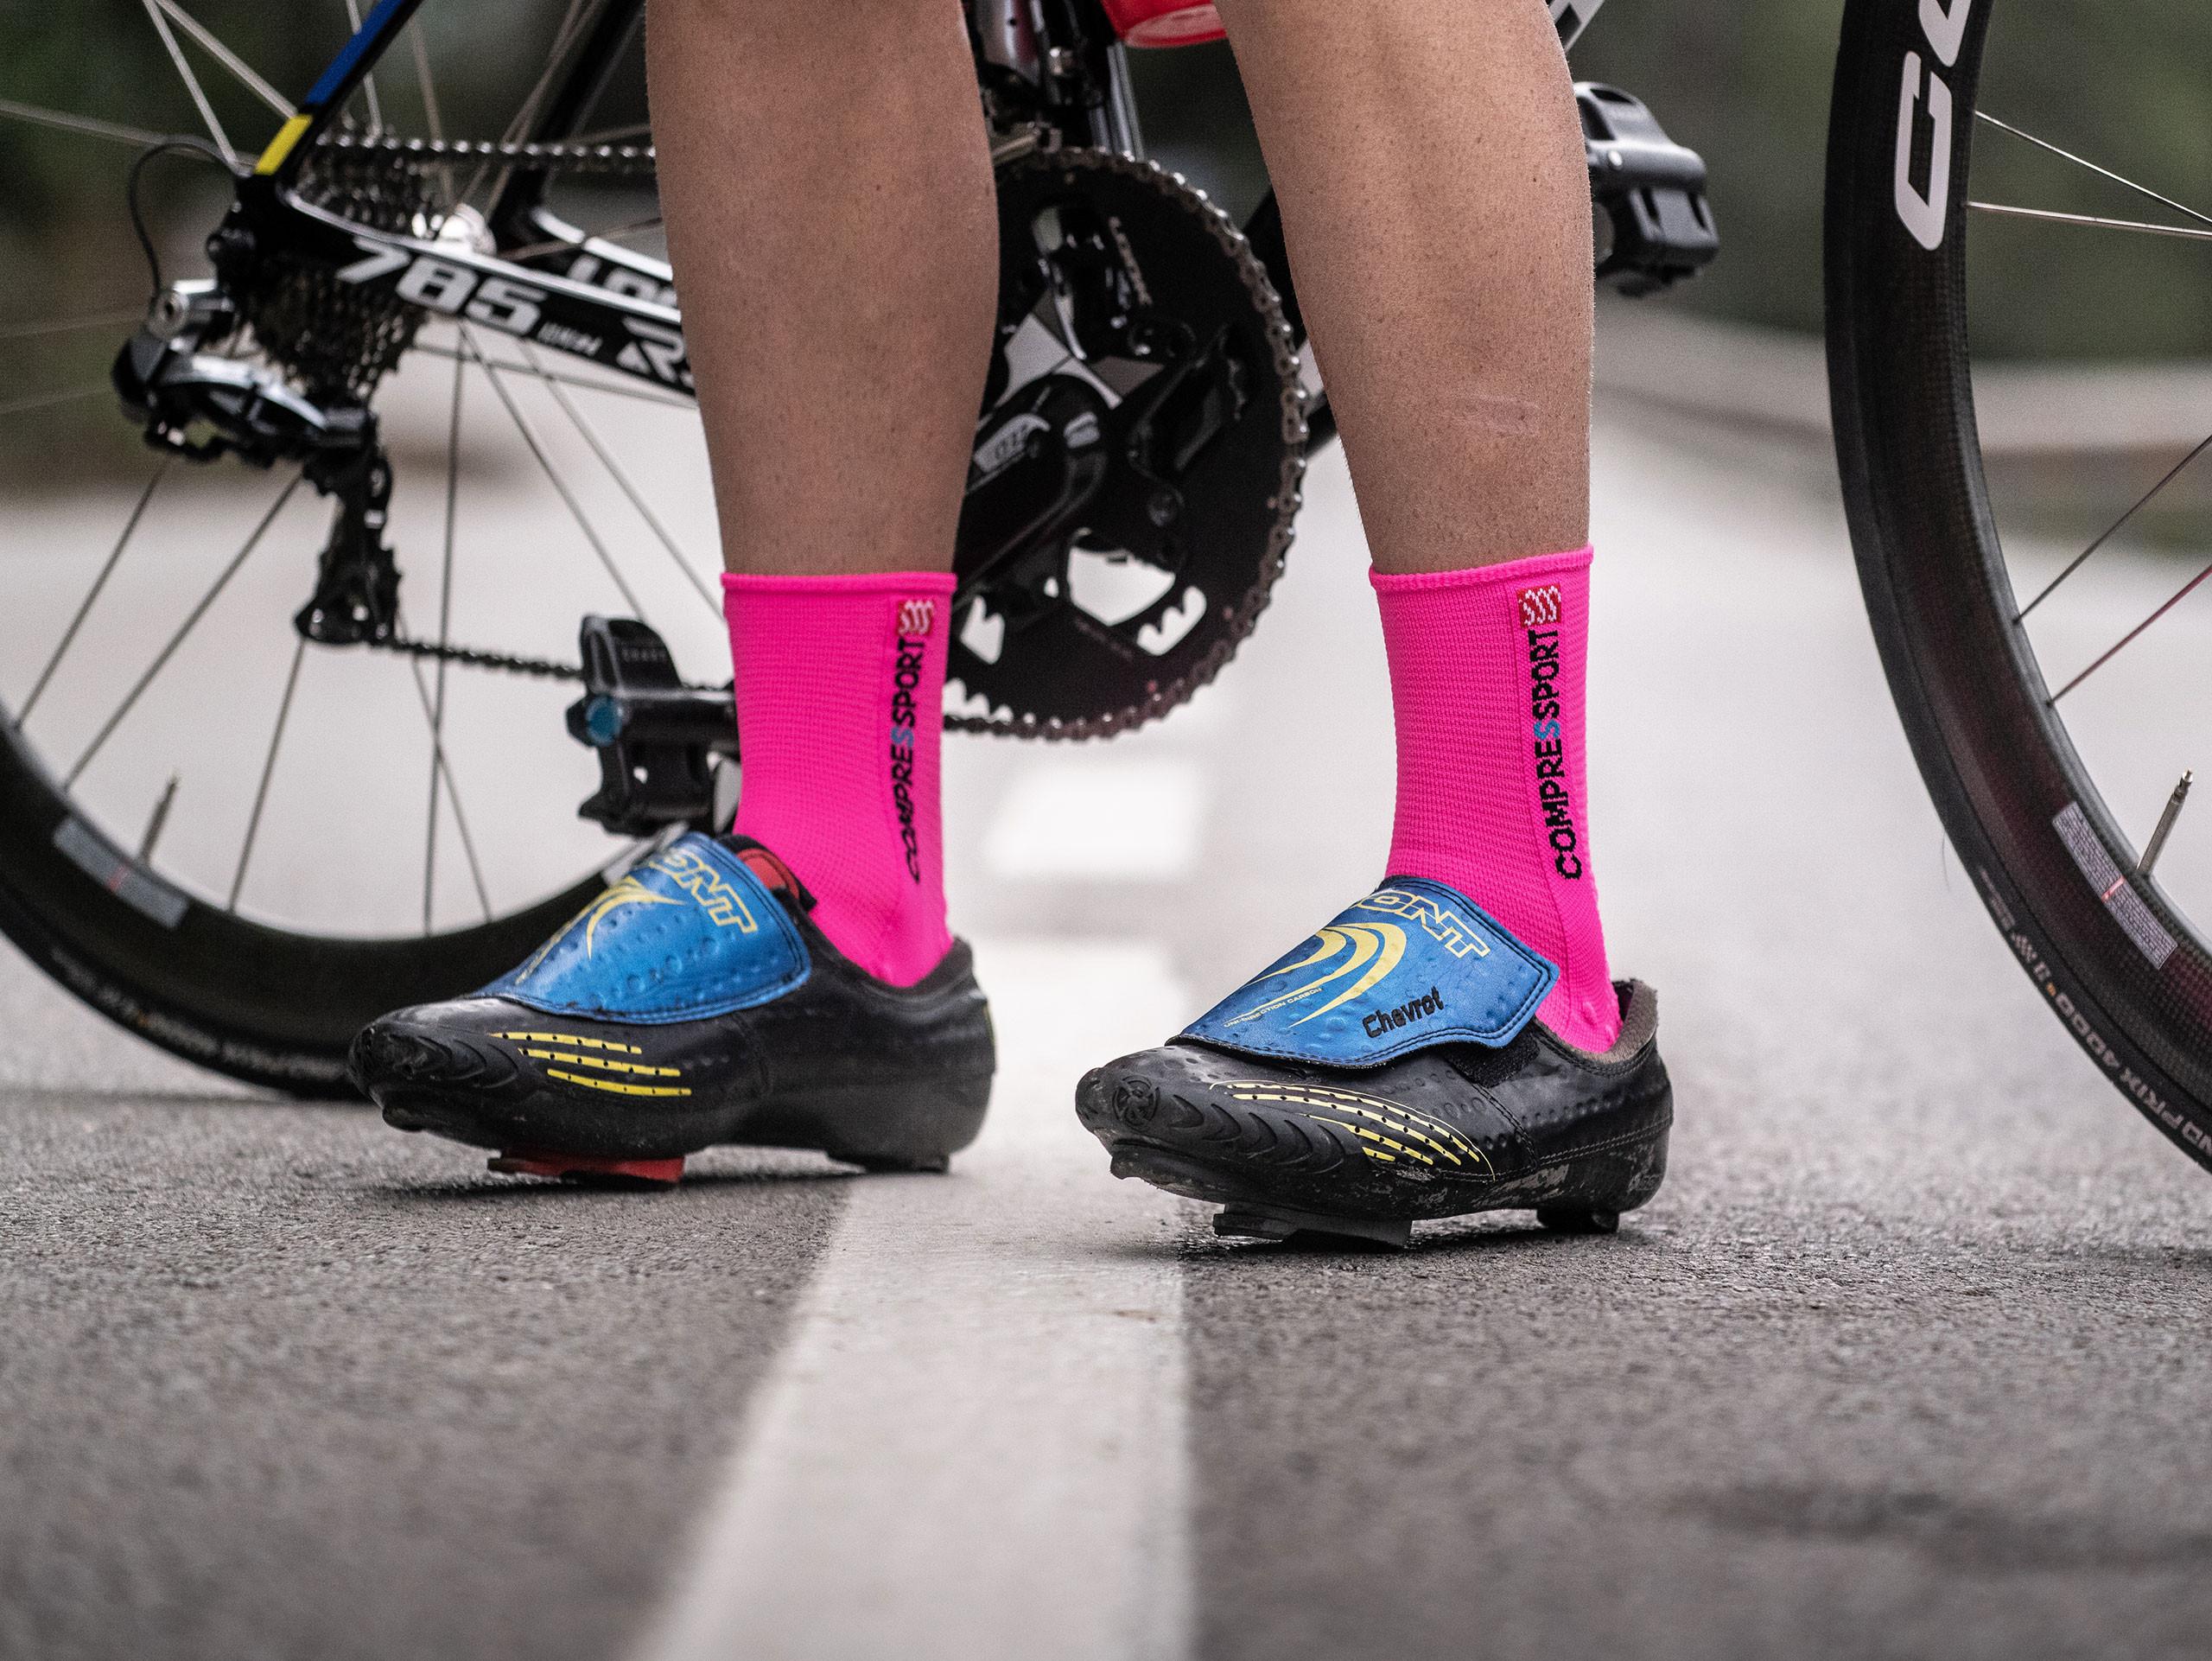 Calzini da gara professionali v3.0 Bike rosa fluo